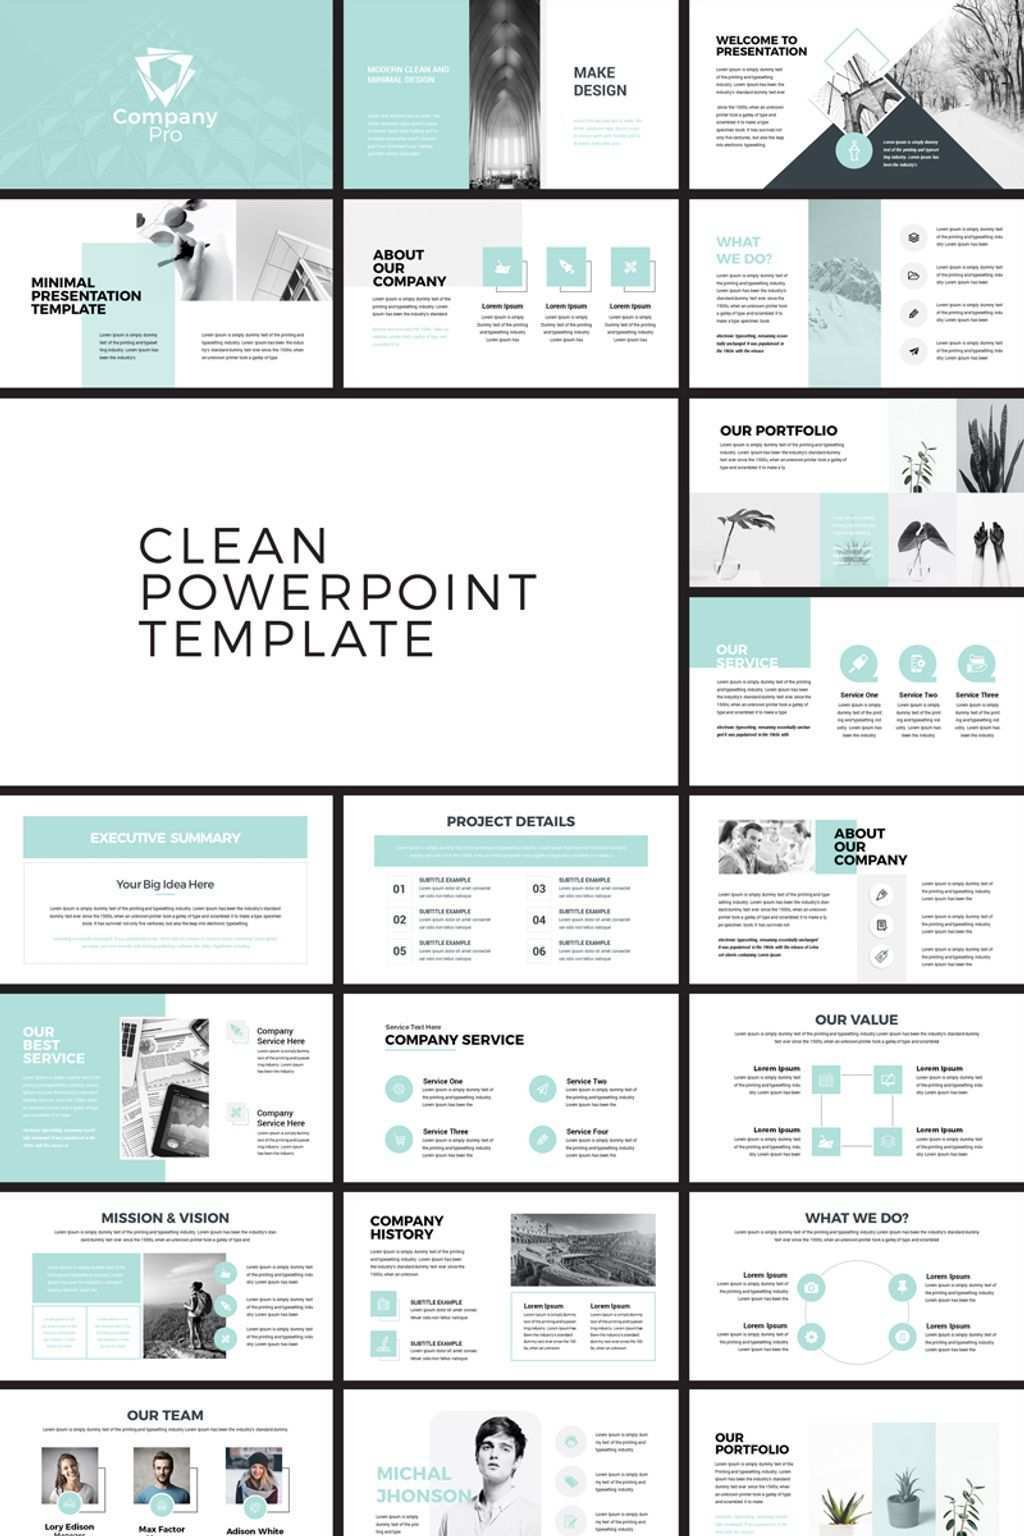 Company Pro Powerpoint Template 77905 Powerpoint Design Templates Presentation Slides Templates Business Powerpoint Presentation